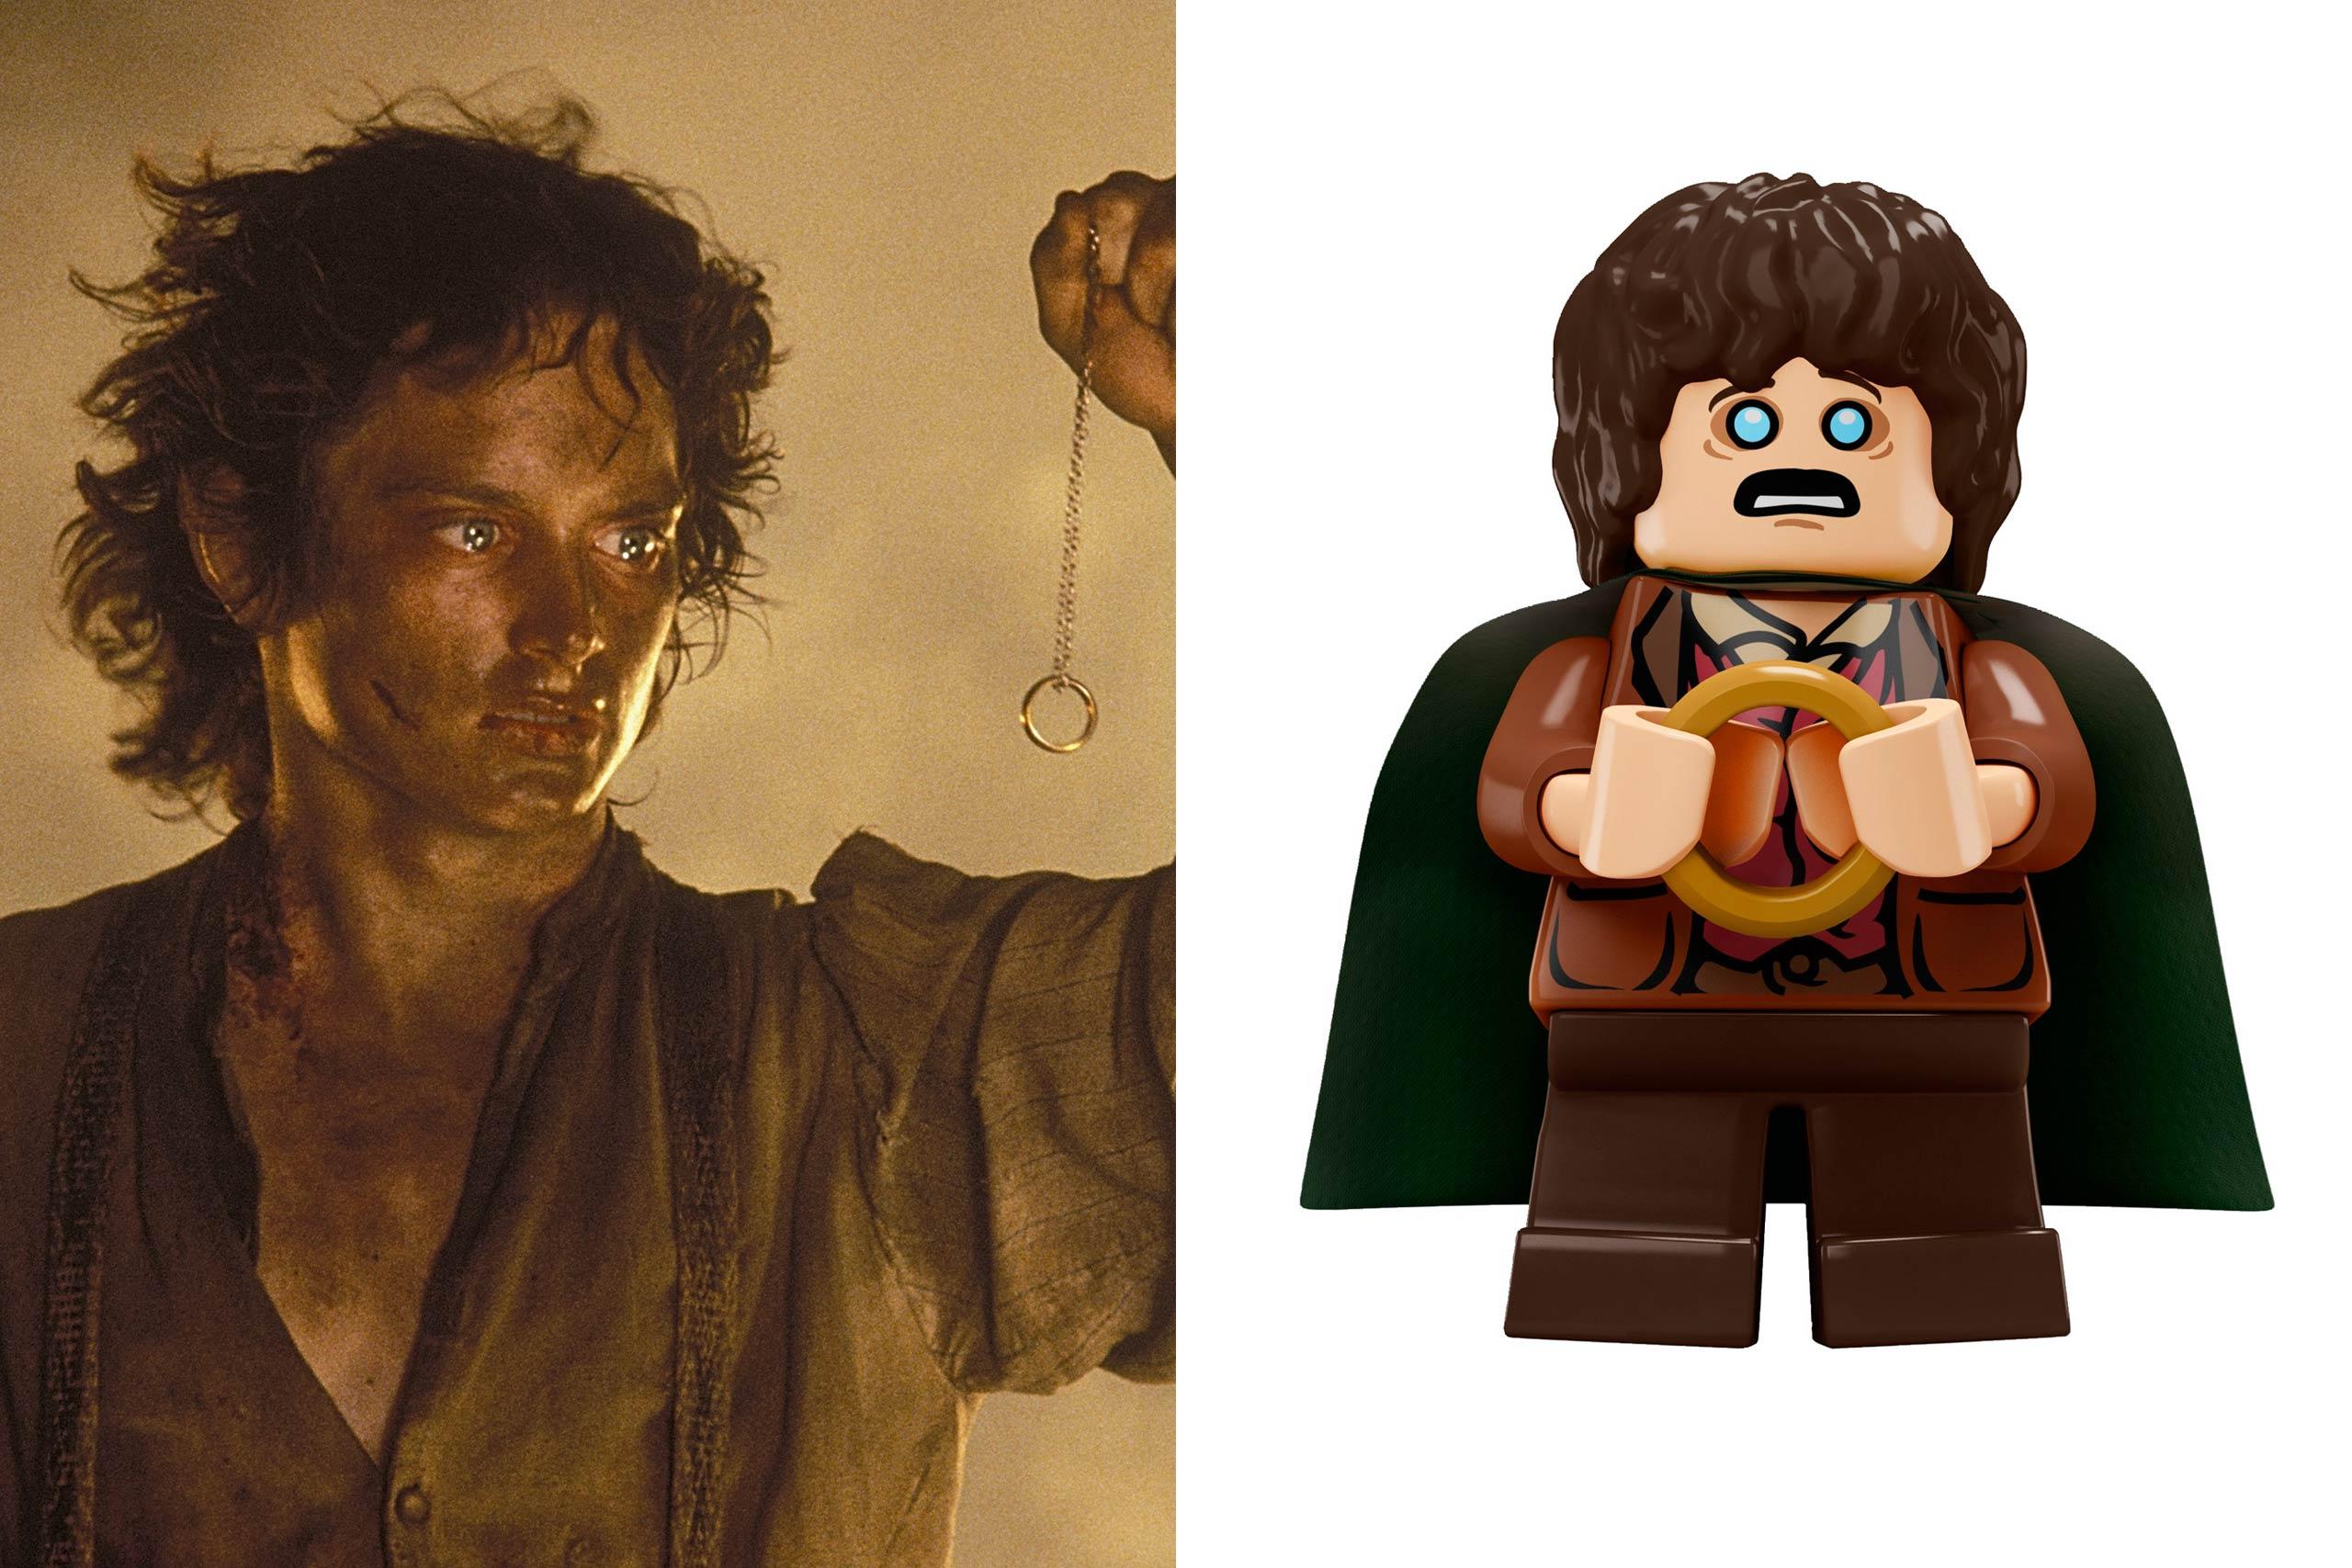 <strong>Elijah Wood: Frodo Baggins</strong>